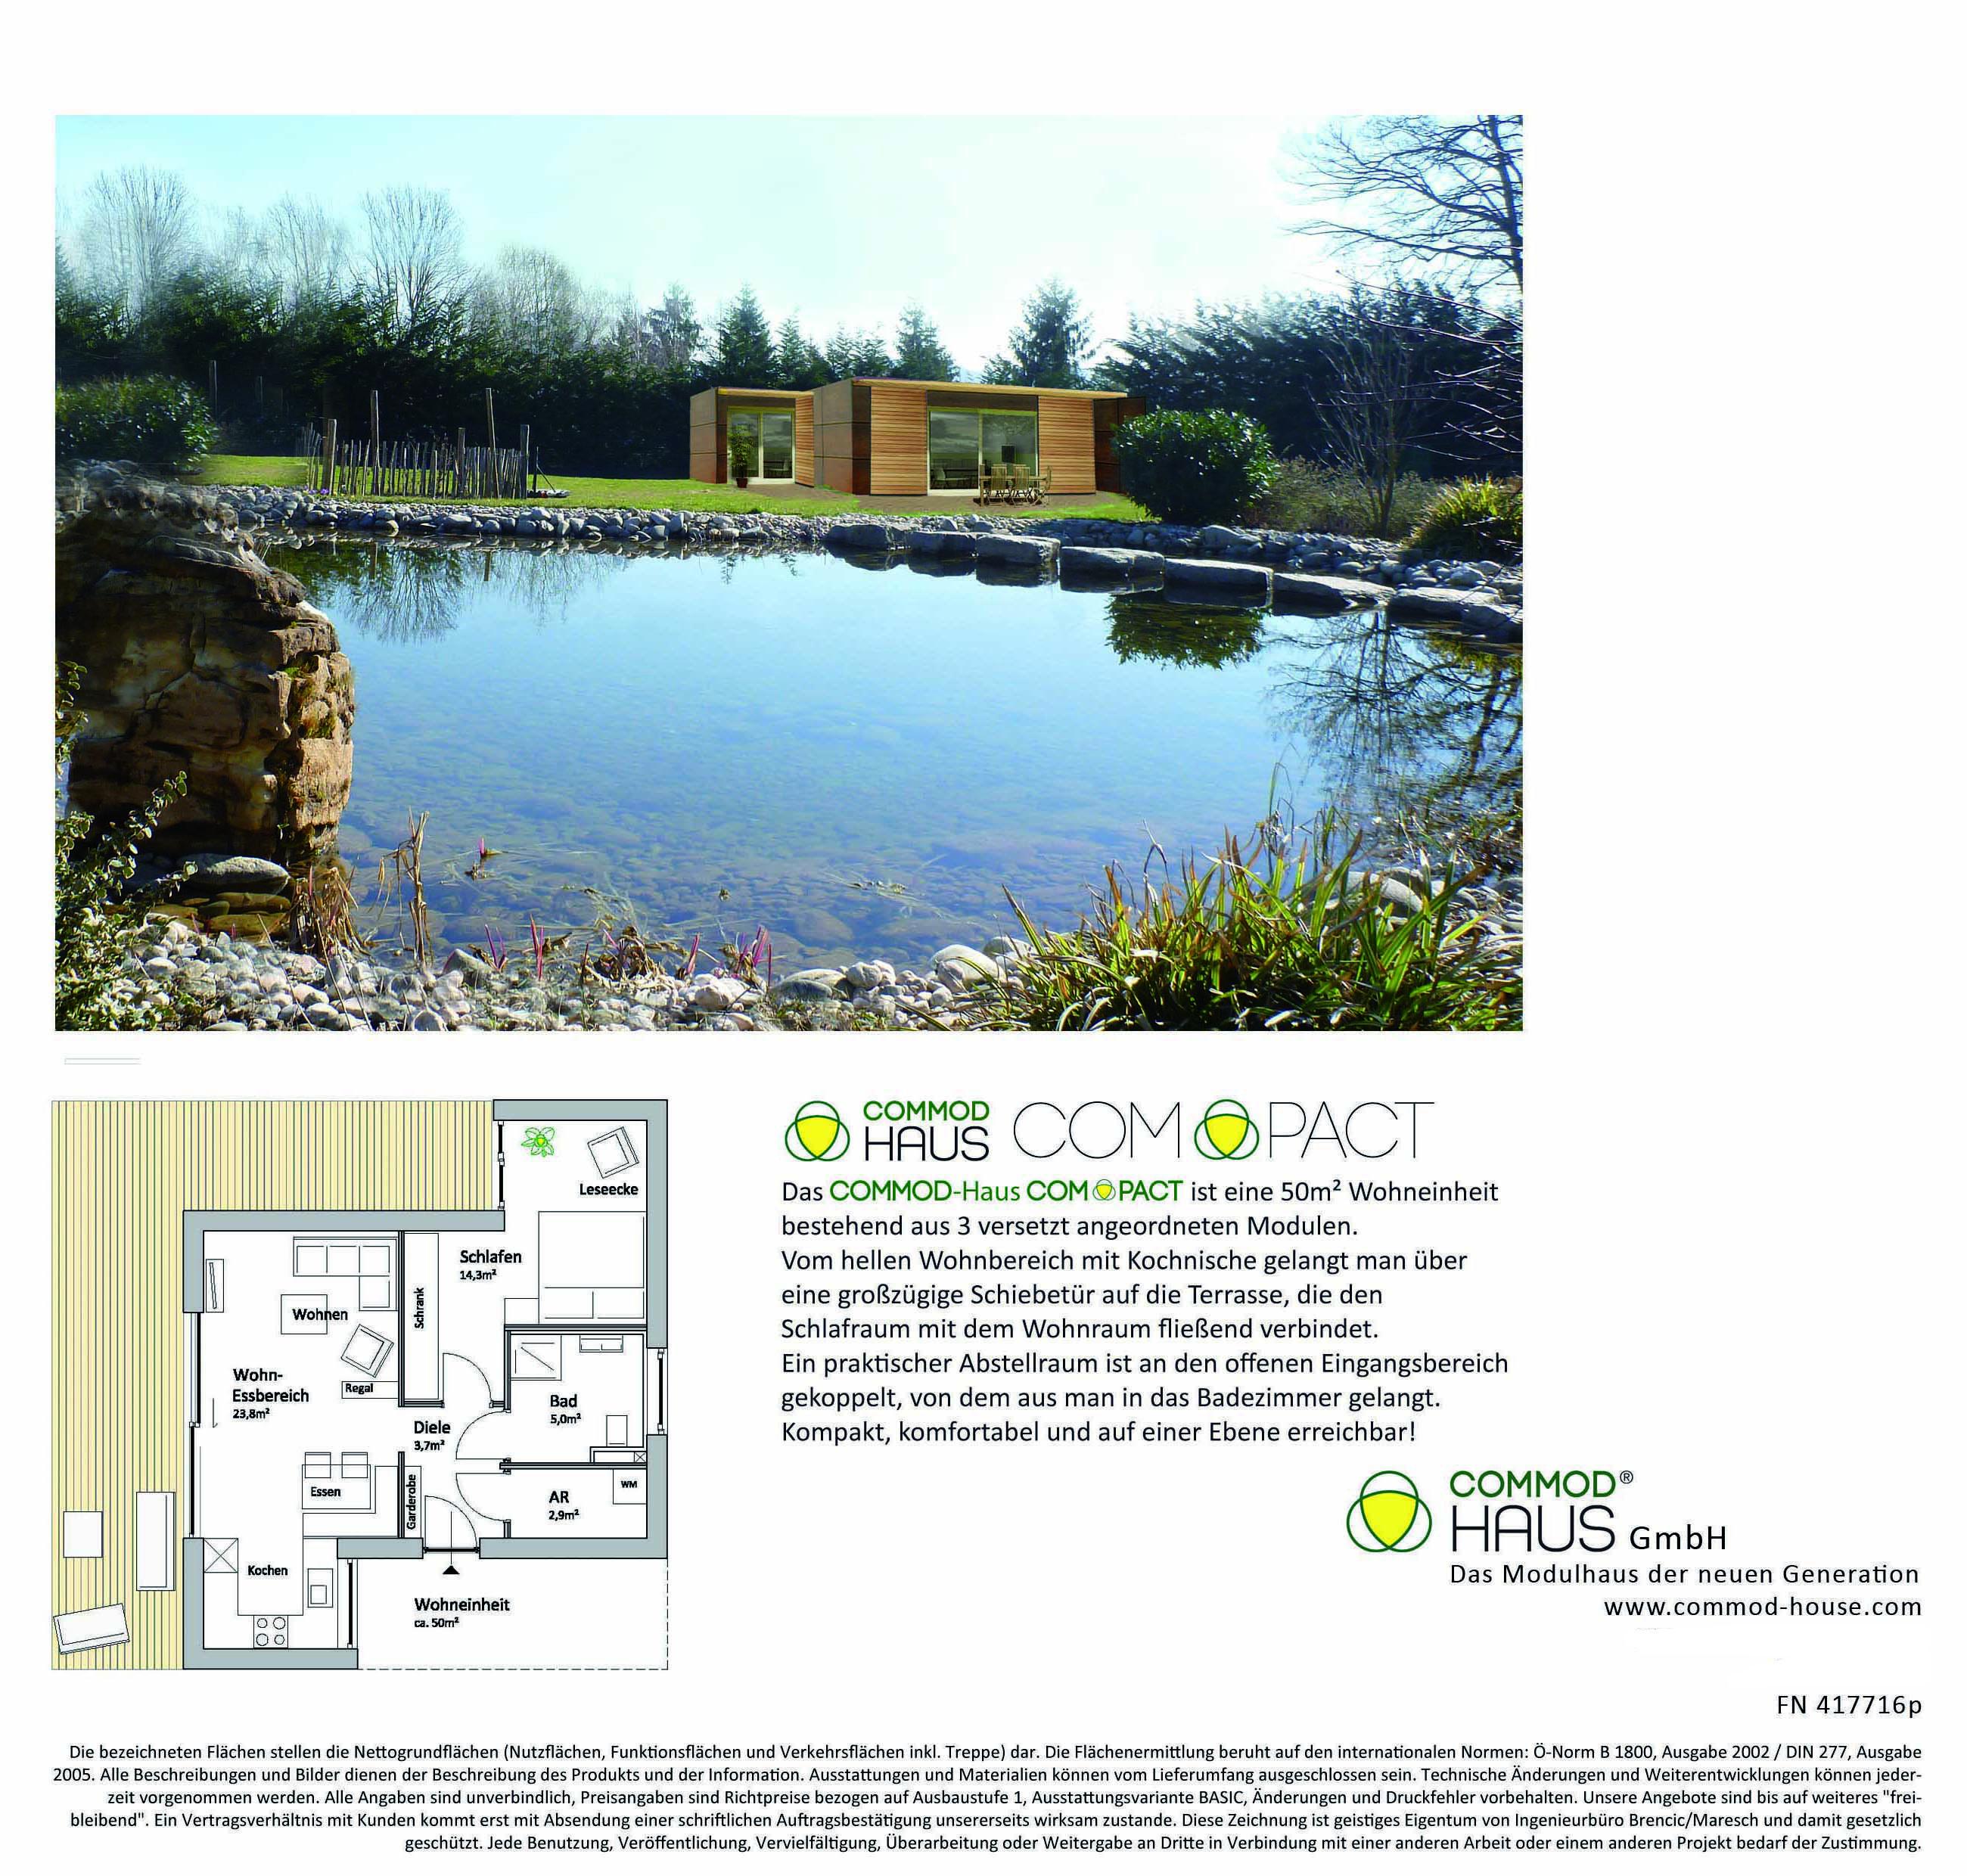 Exquisit Commod Haus Sammlung Von Http://wwwreviewmod-ereview/wp-content/